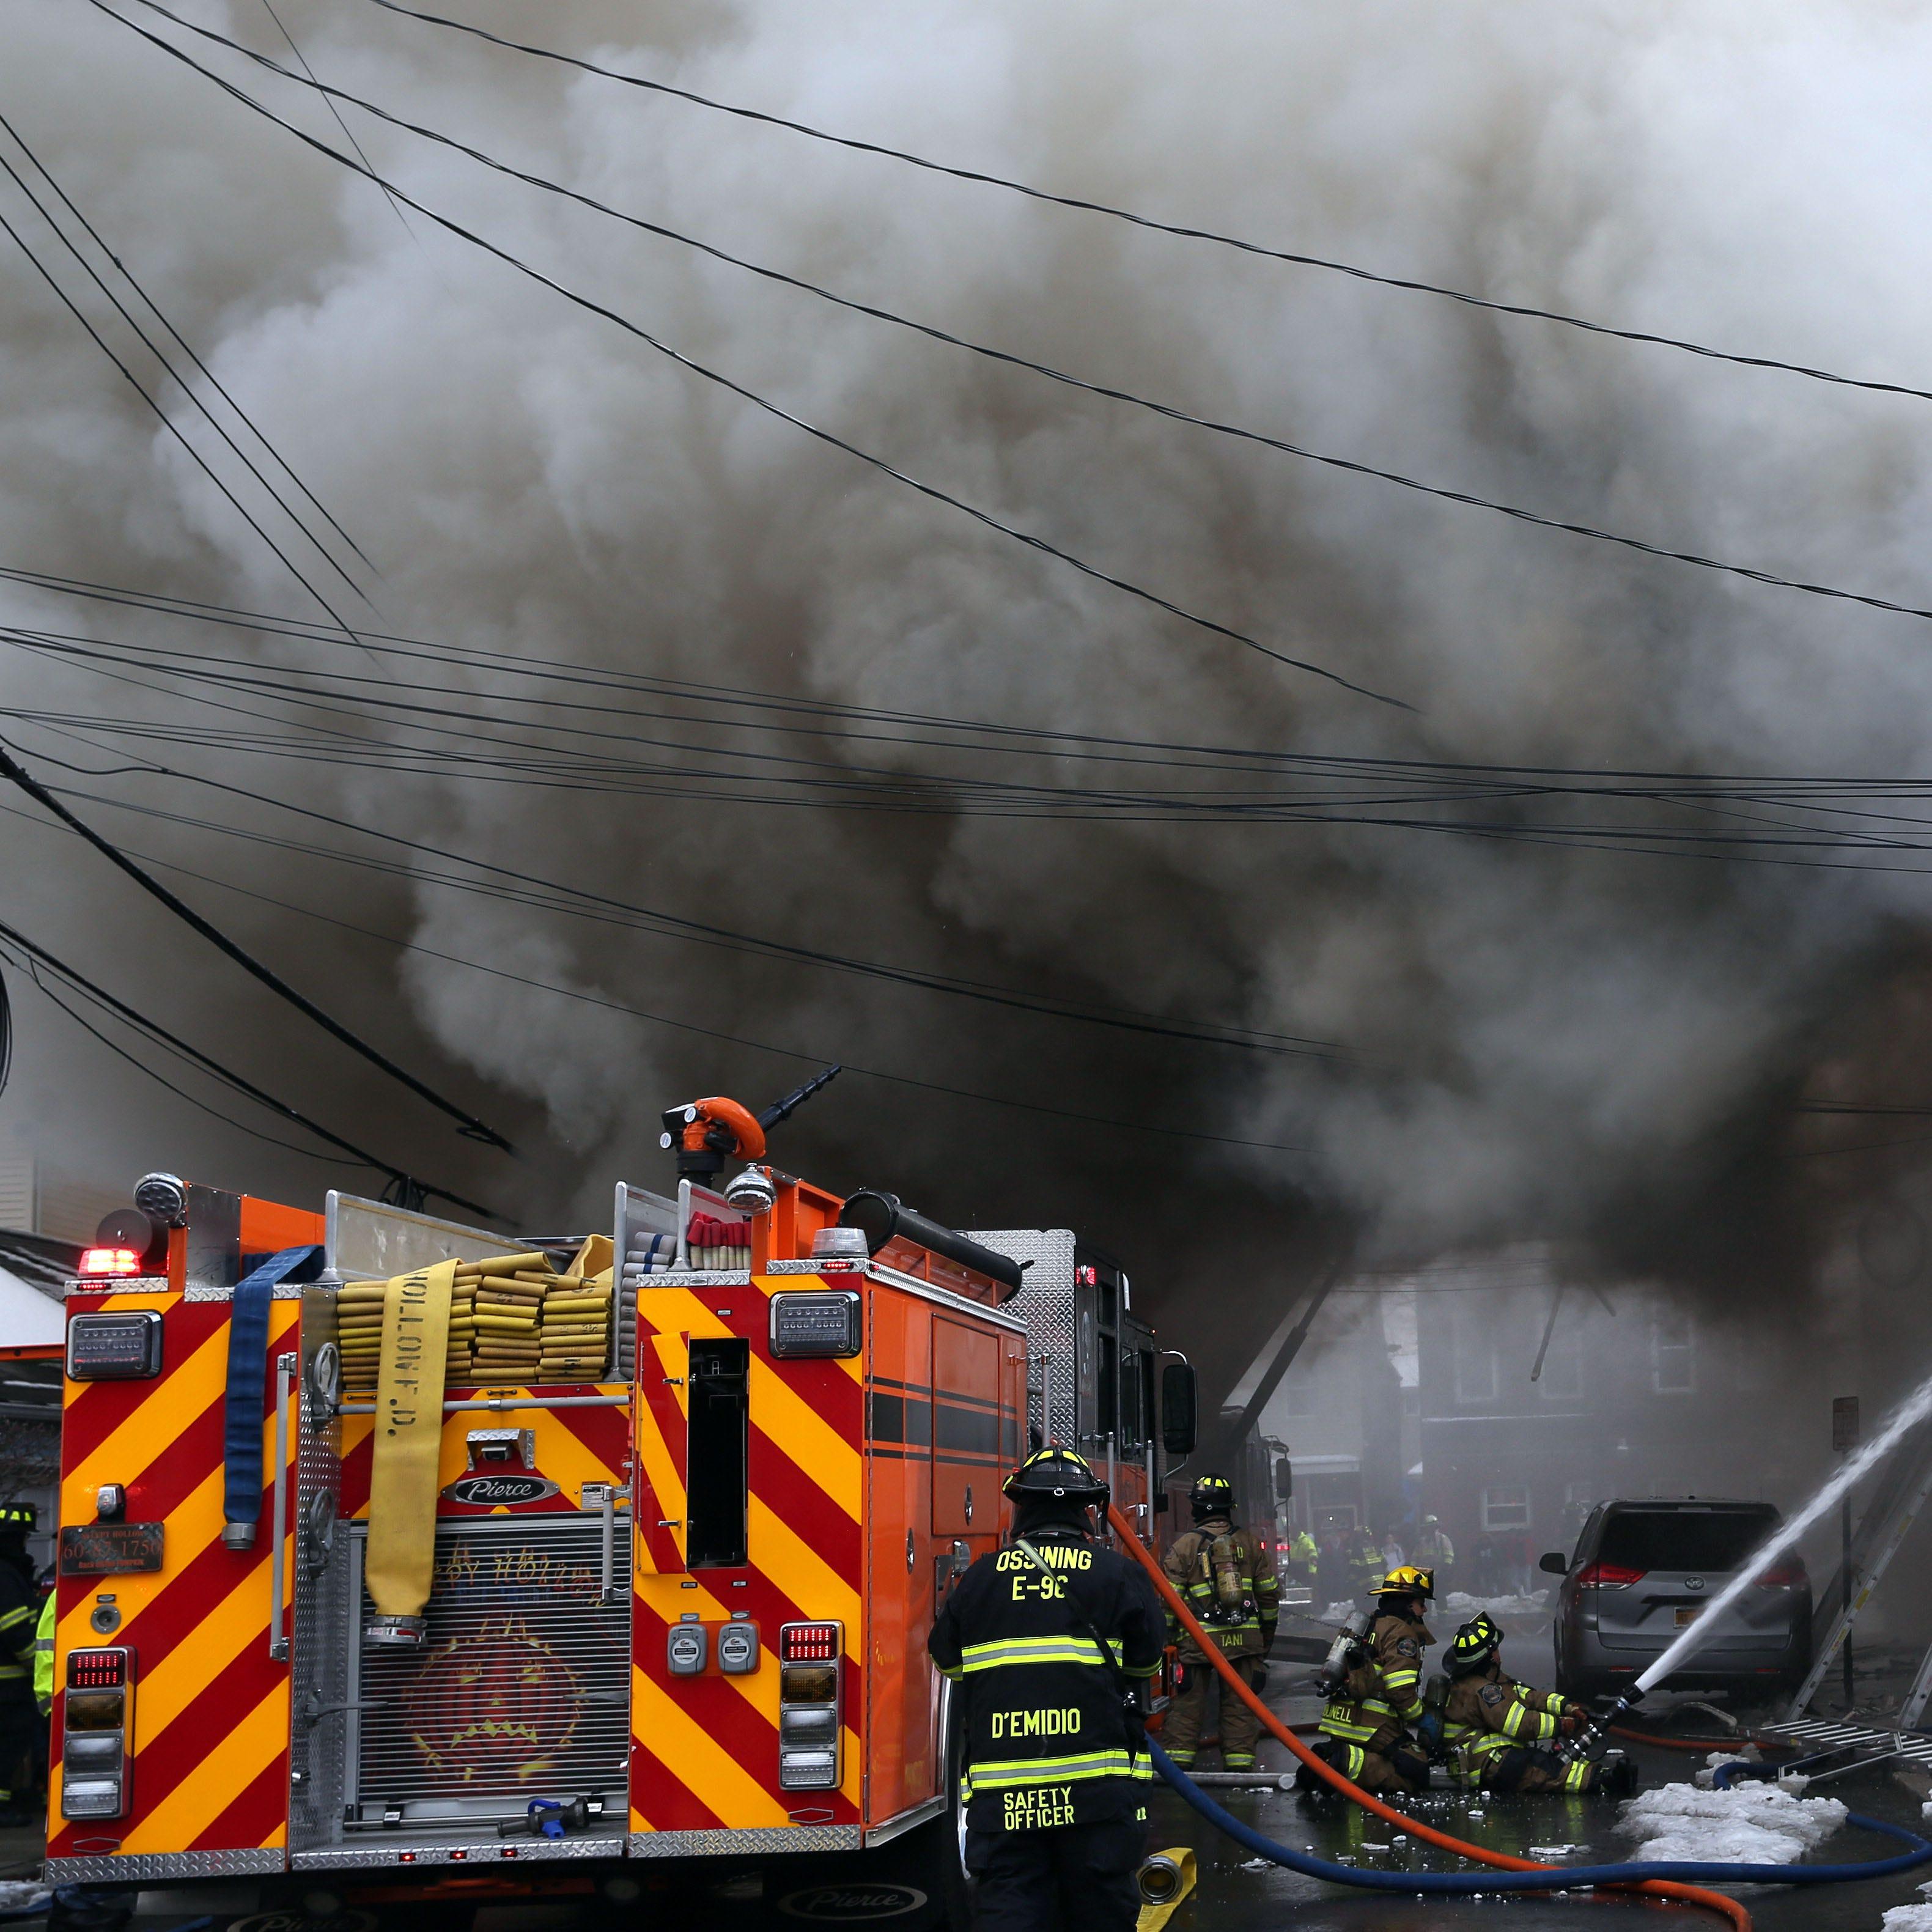 Firefighters battle smoky blaze in Sleepy Hollow; at least 27 homeless